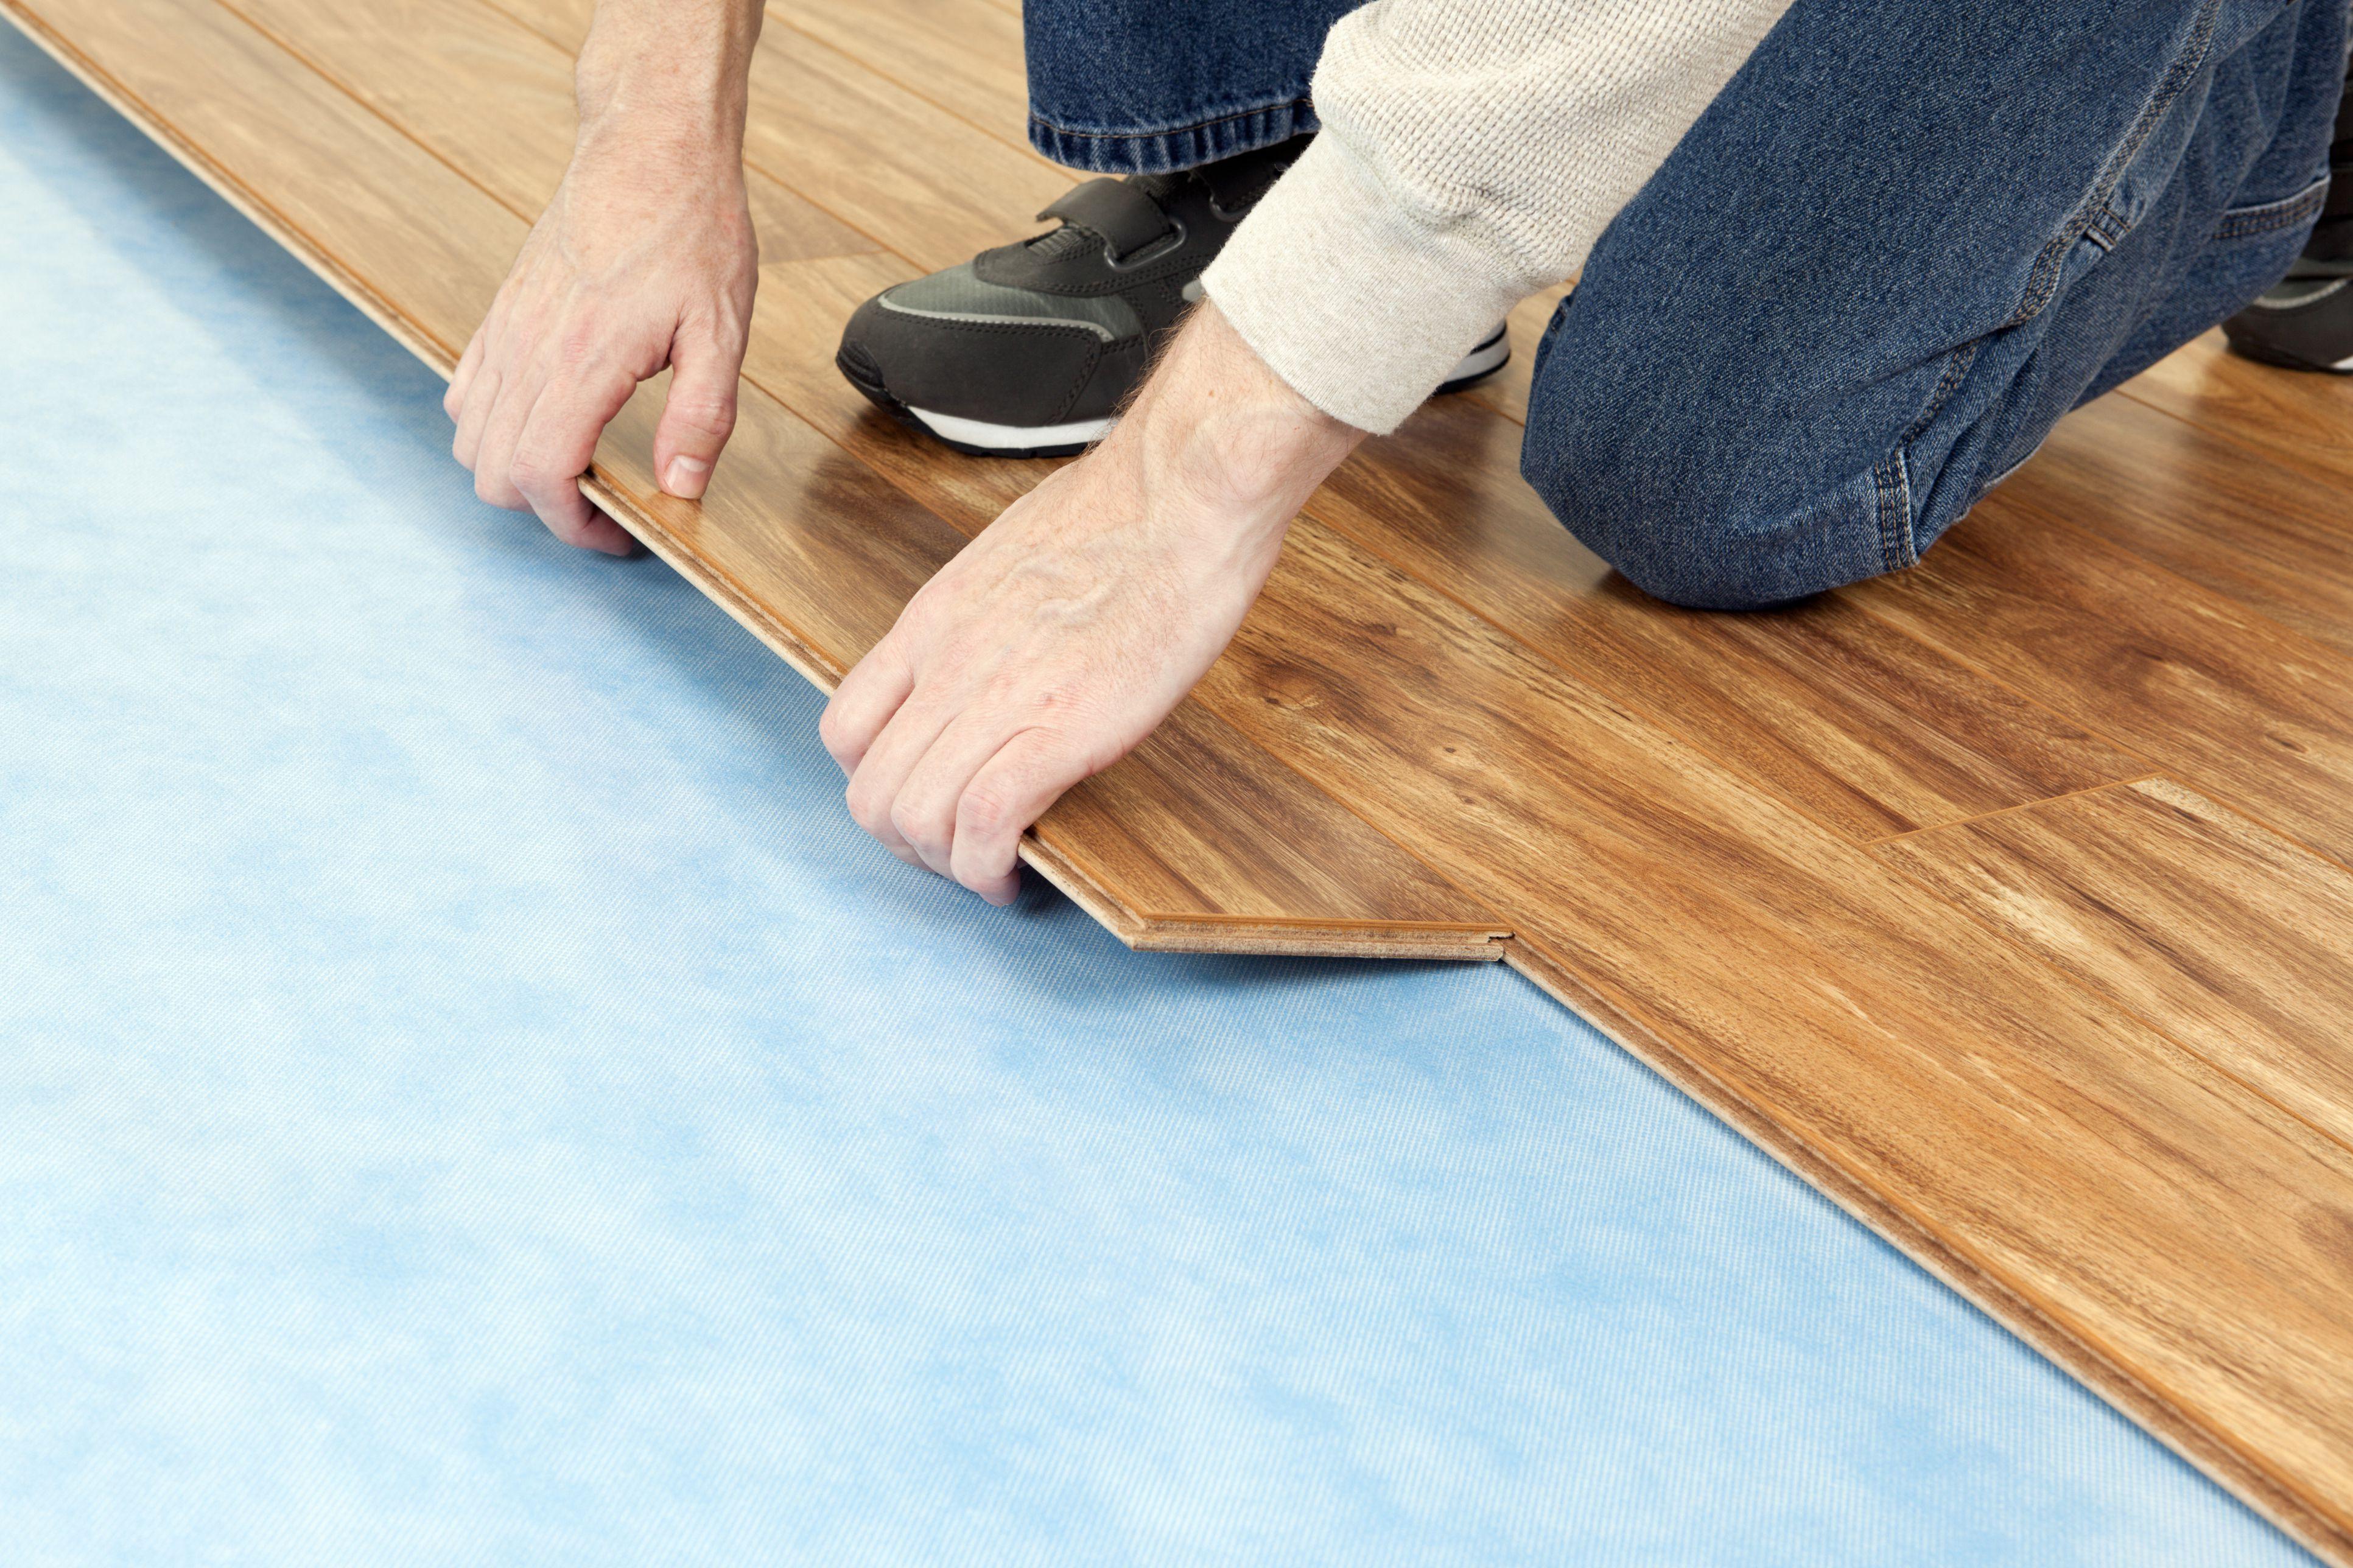 7 inch hardwood flooring of flooring underlayment the basics regarding new floor installation 185270632 582b722c3df78c6f6af0a8ab